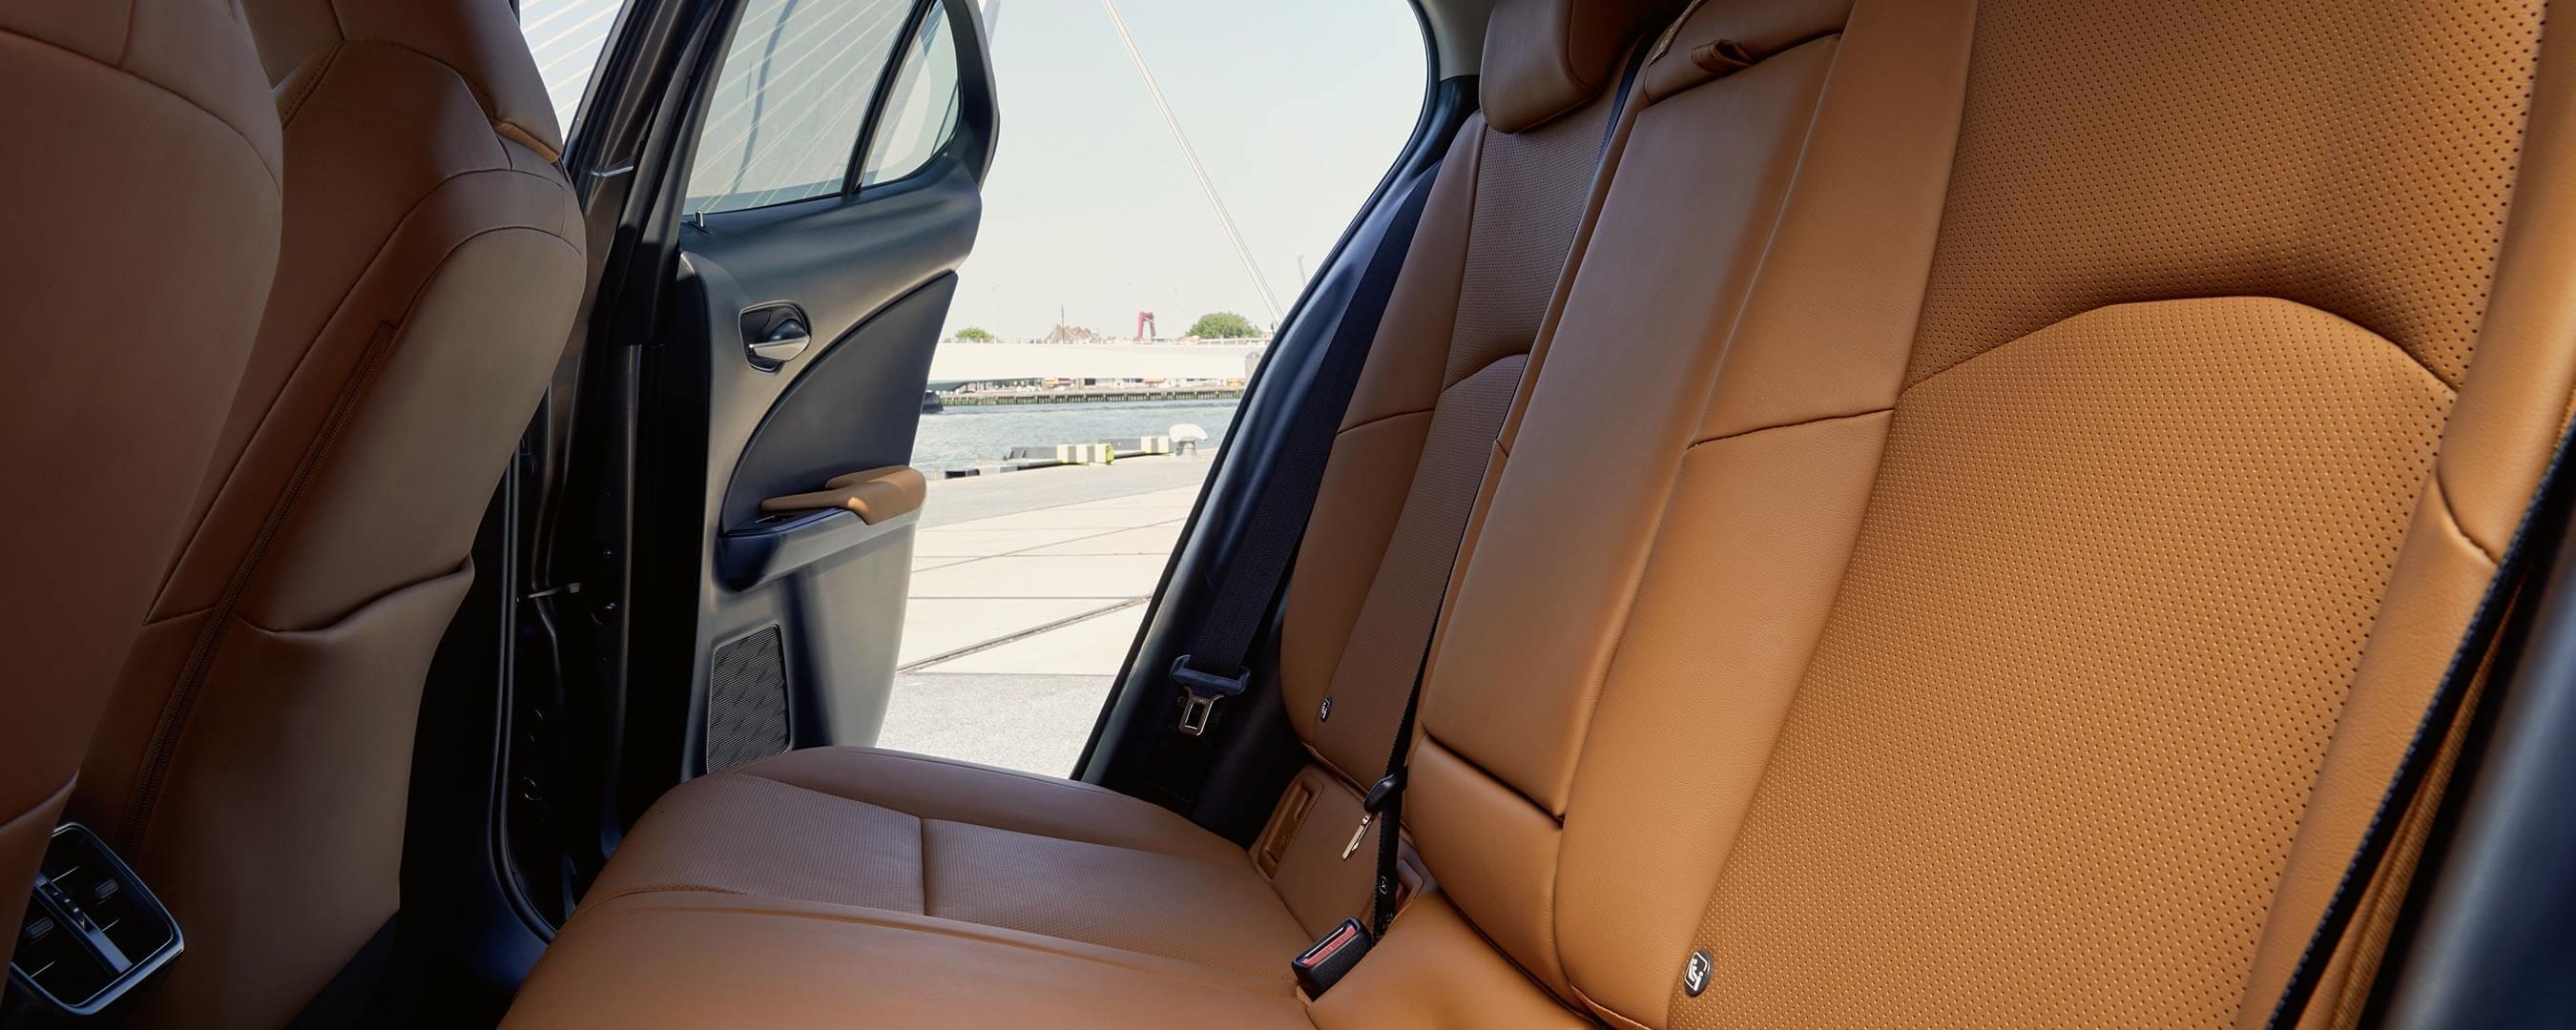 2020 lexus ux ev experience interior back